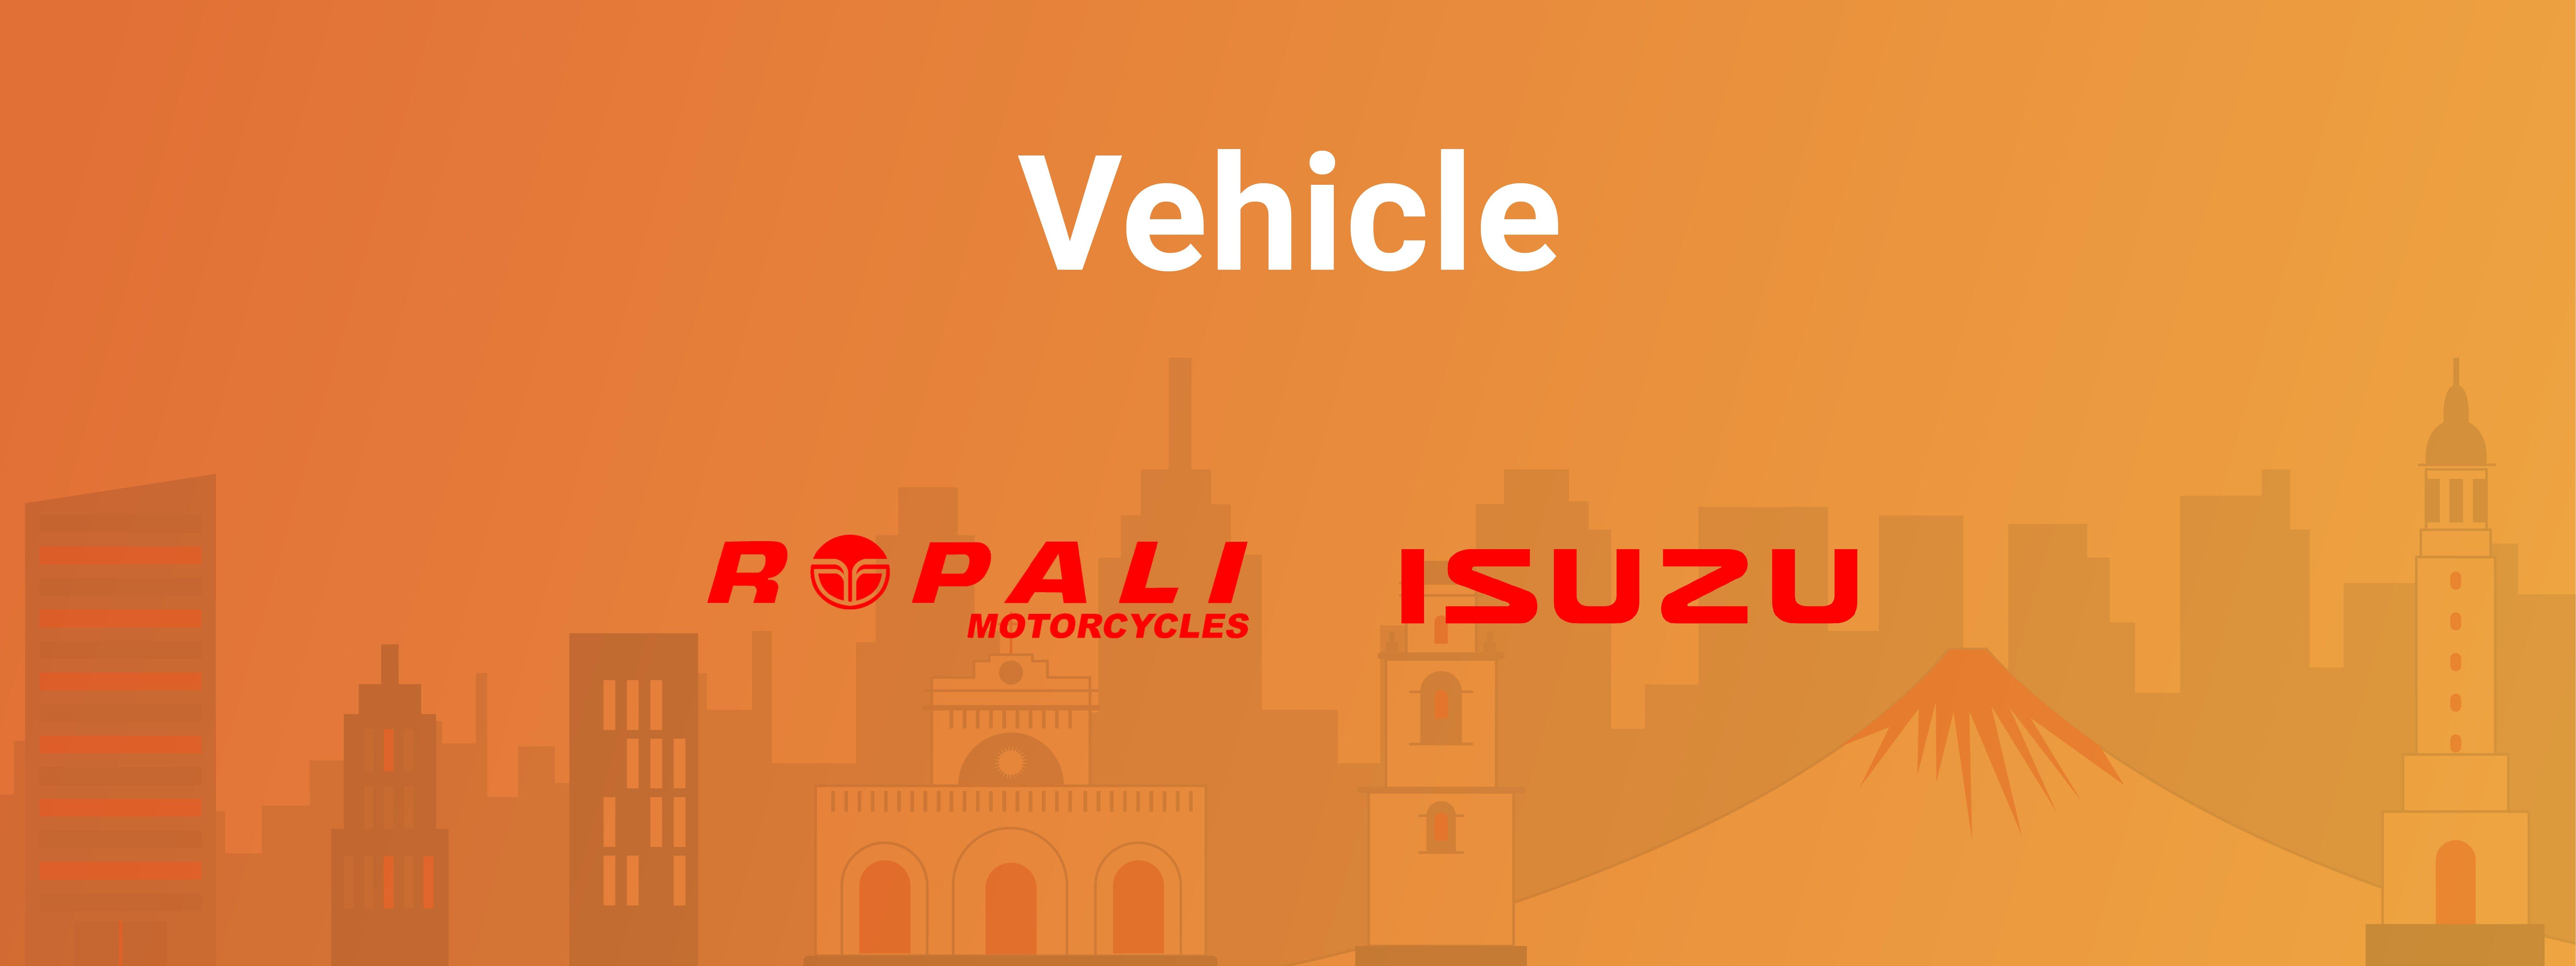 Vehicle_Panalomoves-07